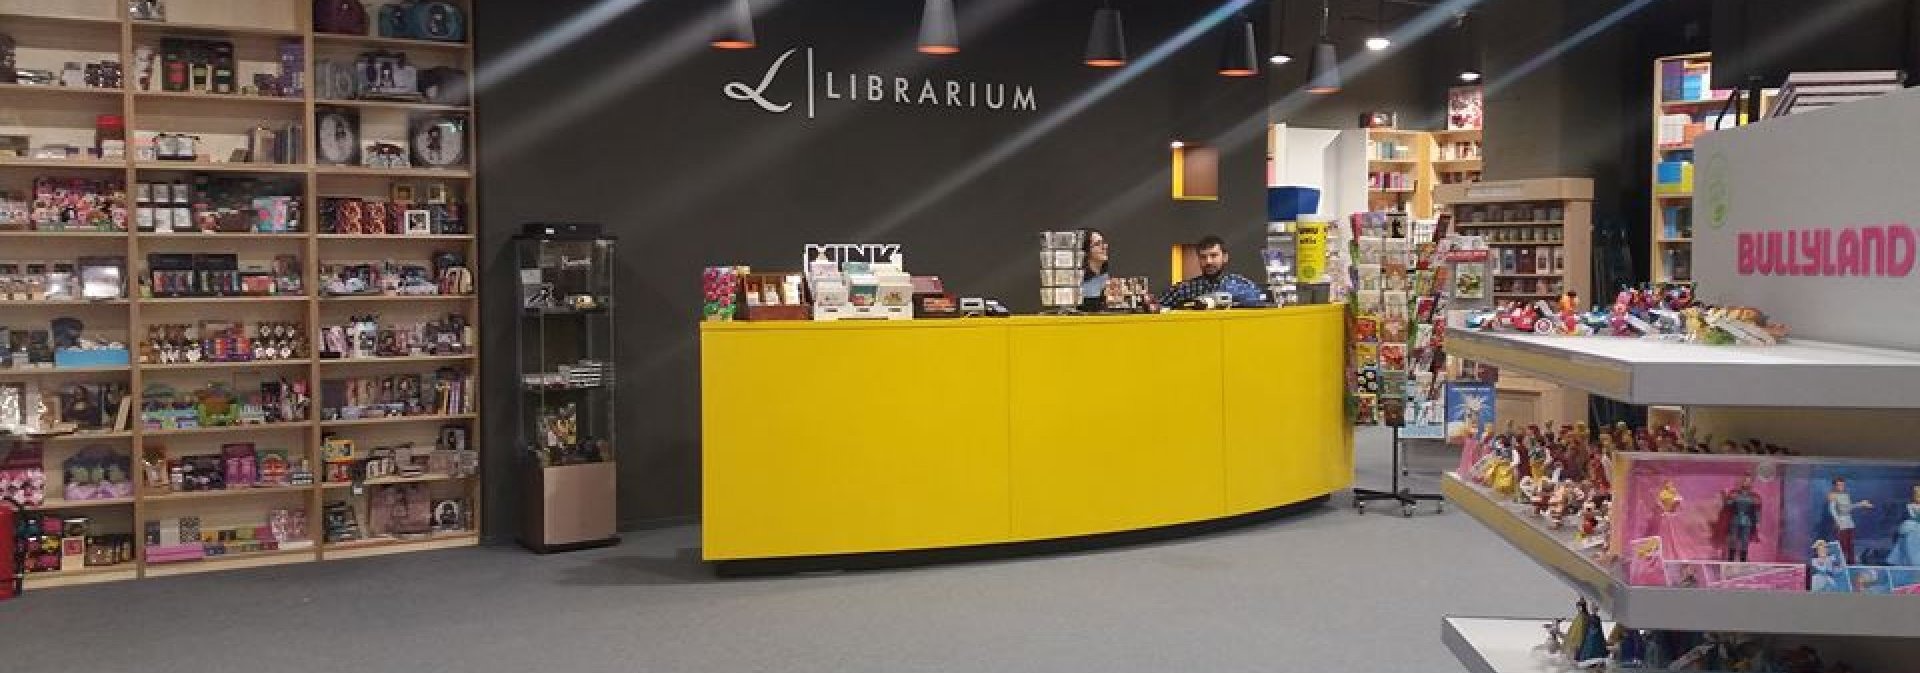 Librarium (Carrefour Felicia), Iași